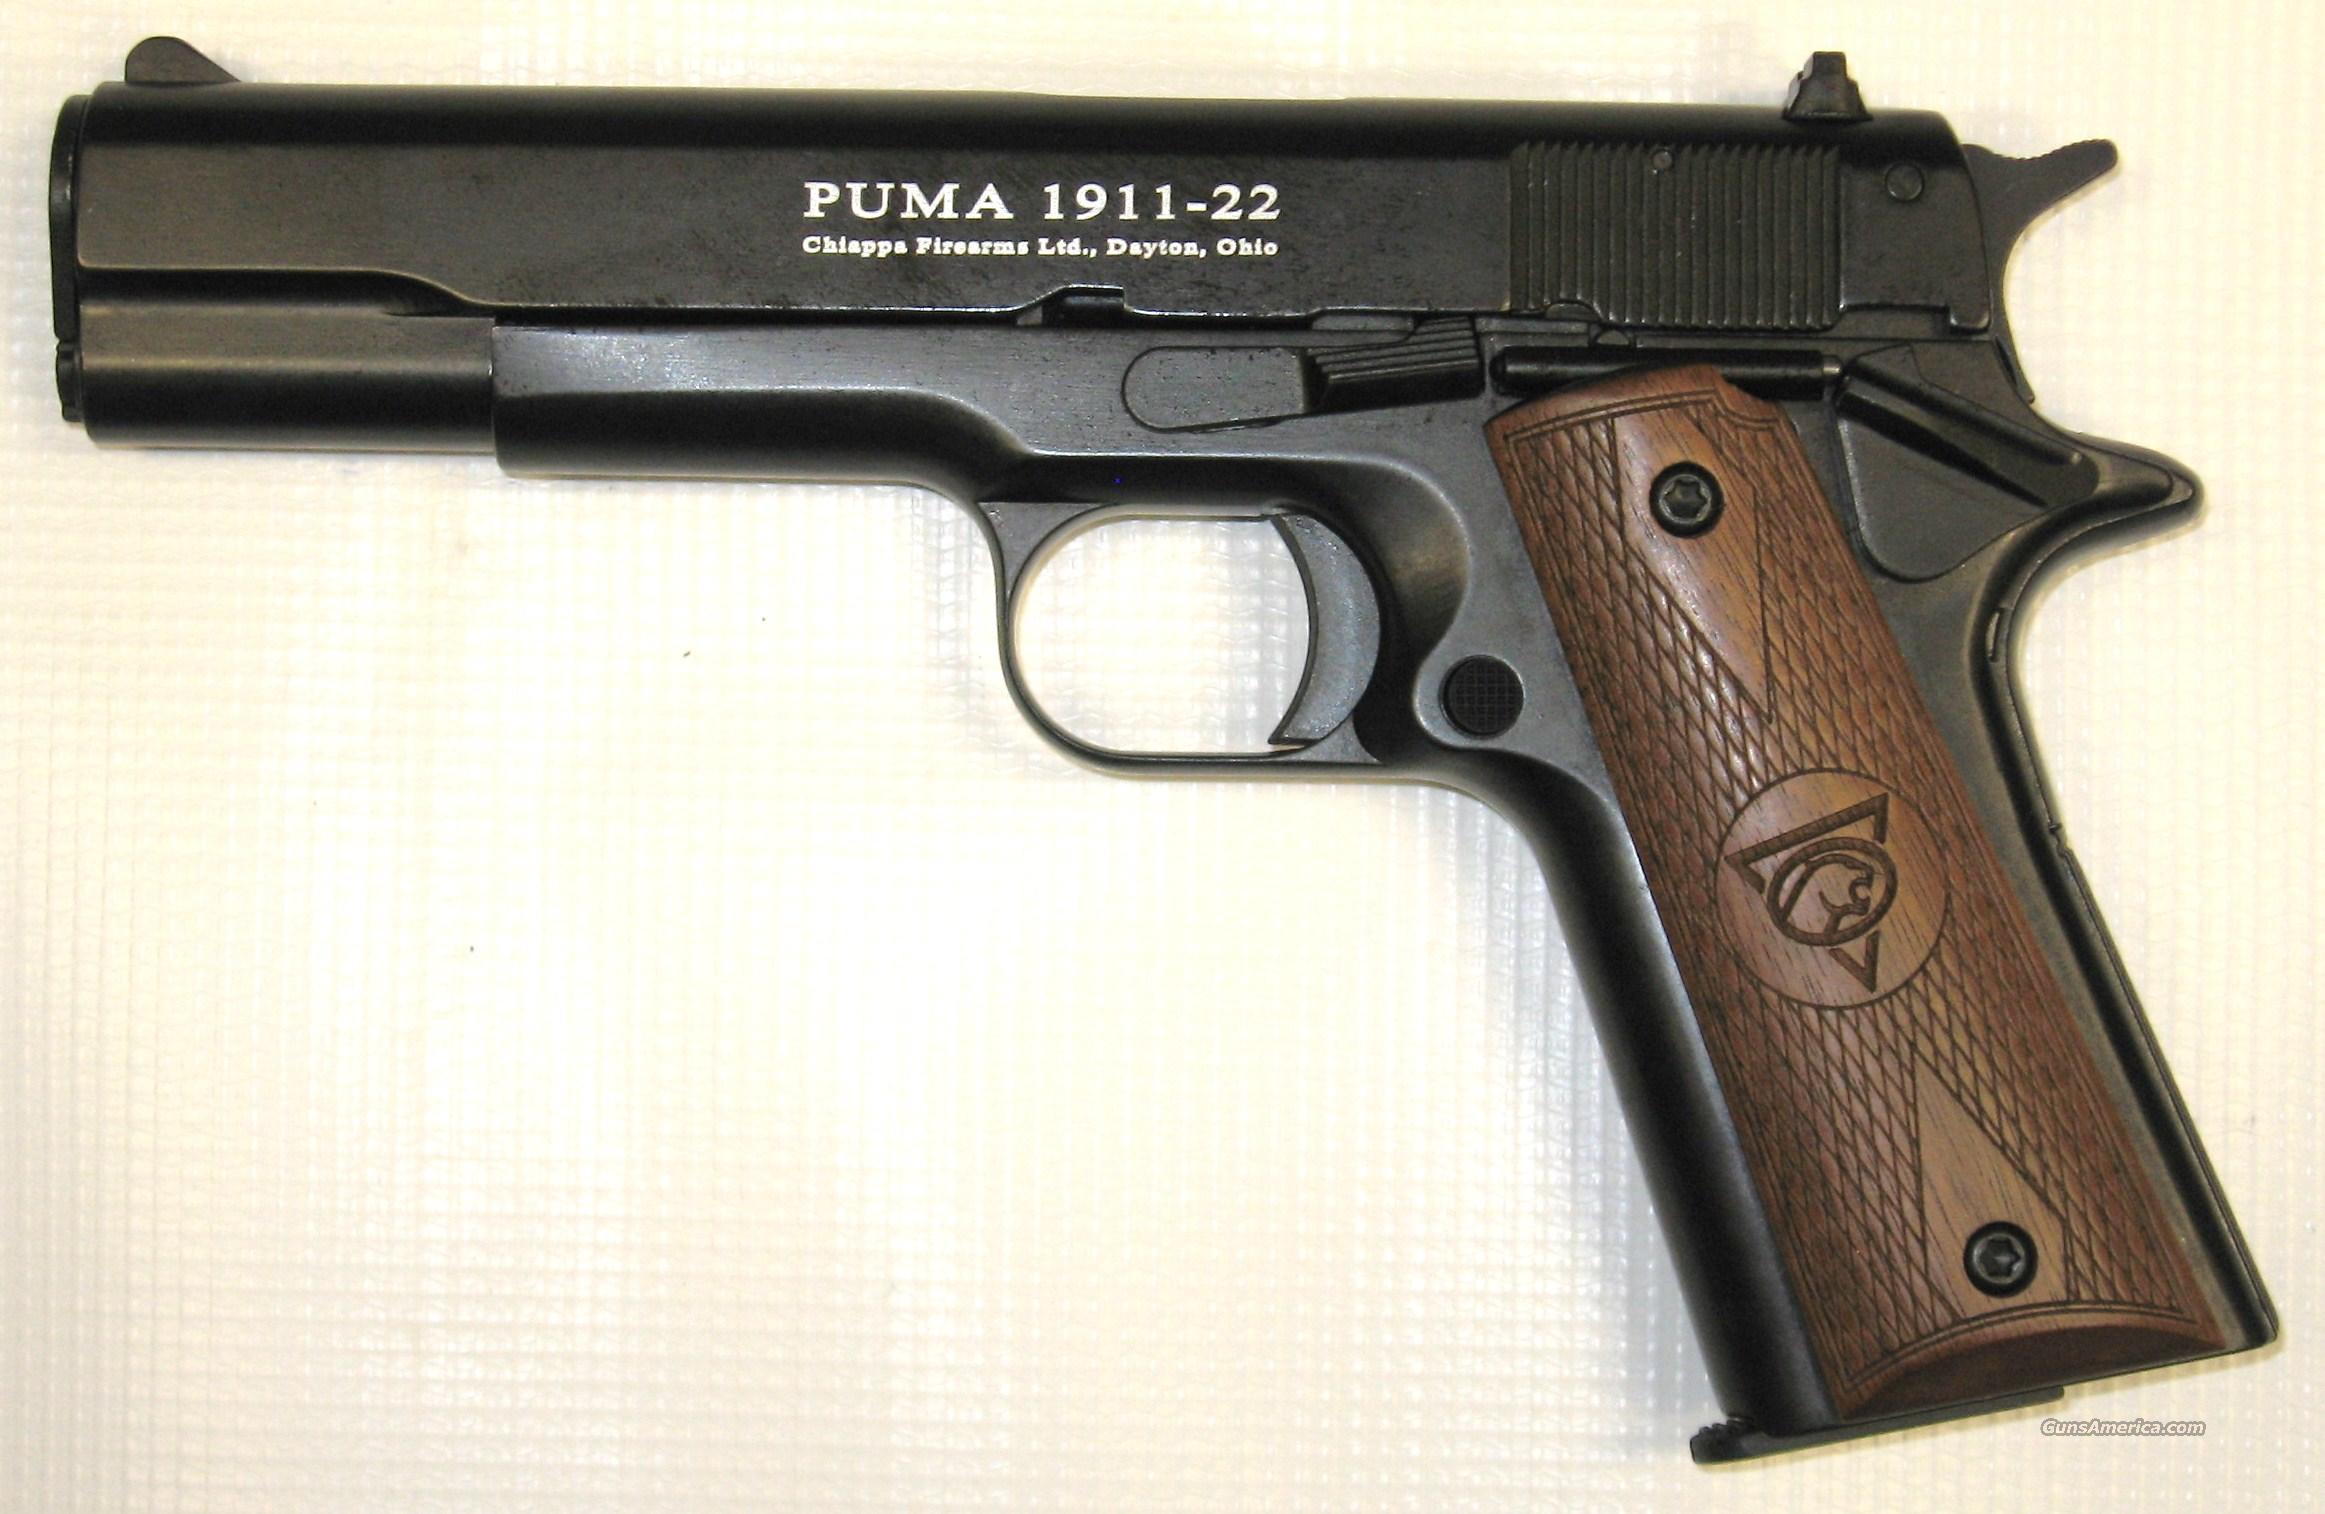 Chiappa Firearms Puma 1911 .22LR  Guns > Pistols > Chiappa Pistols & Revolvers > .22 Cal 1911